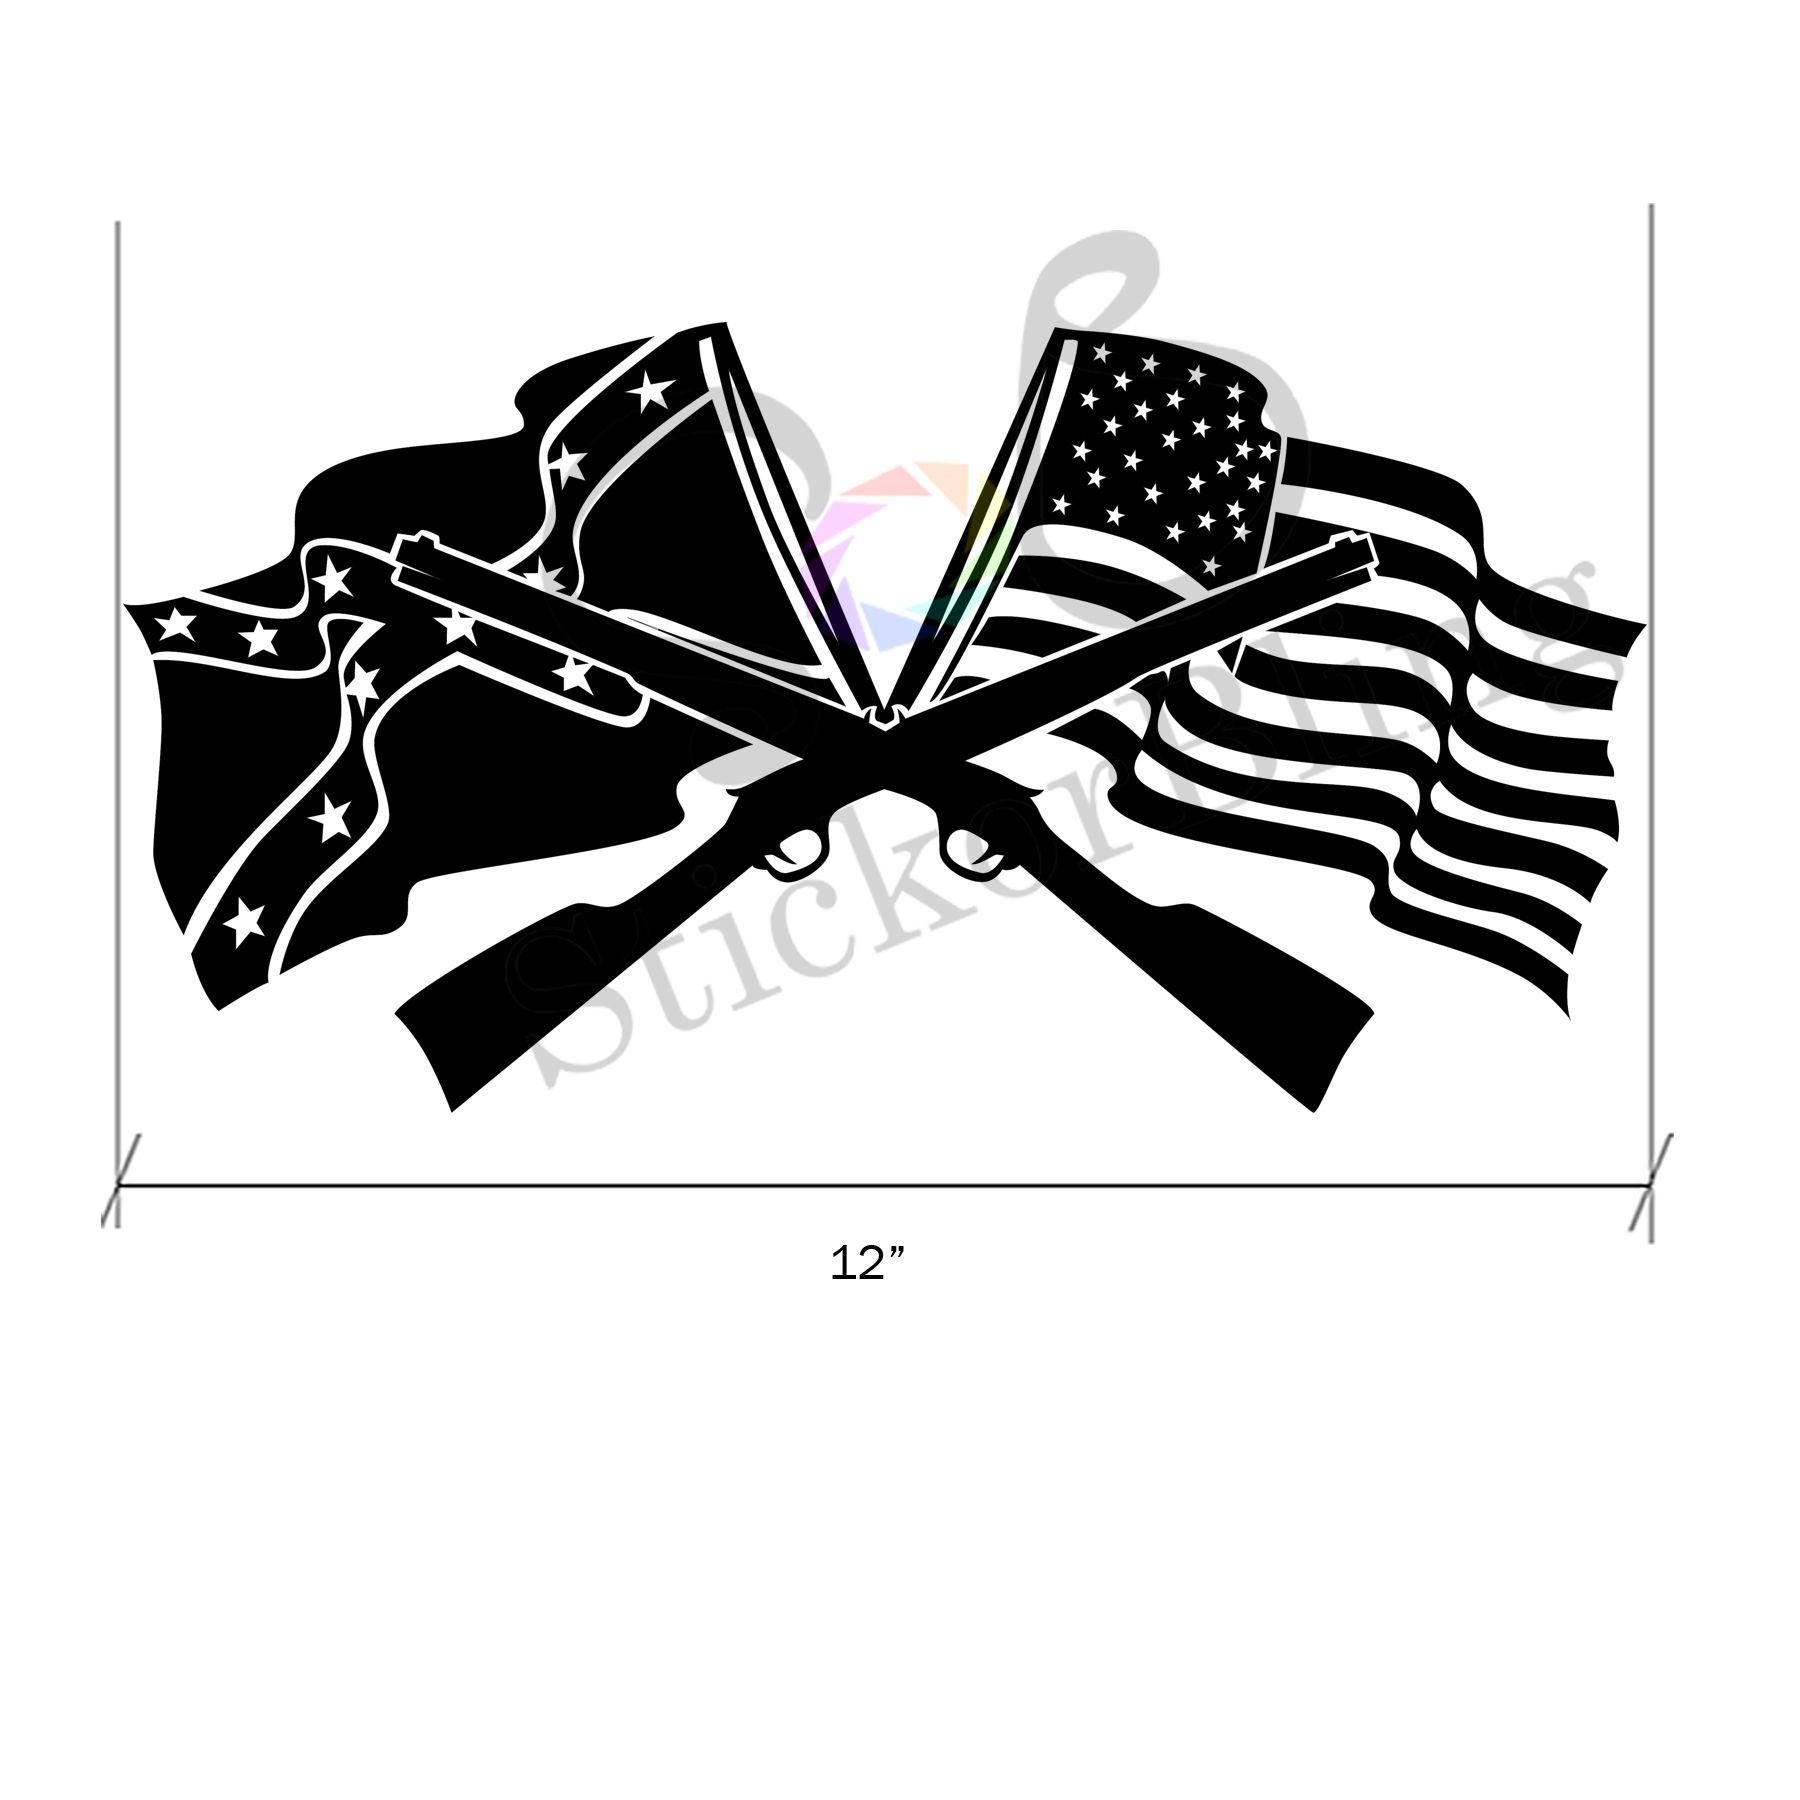 confederate flag american flag gun 12